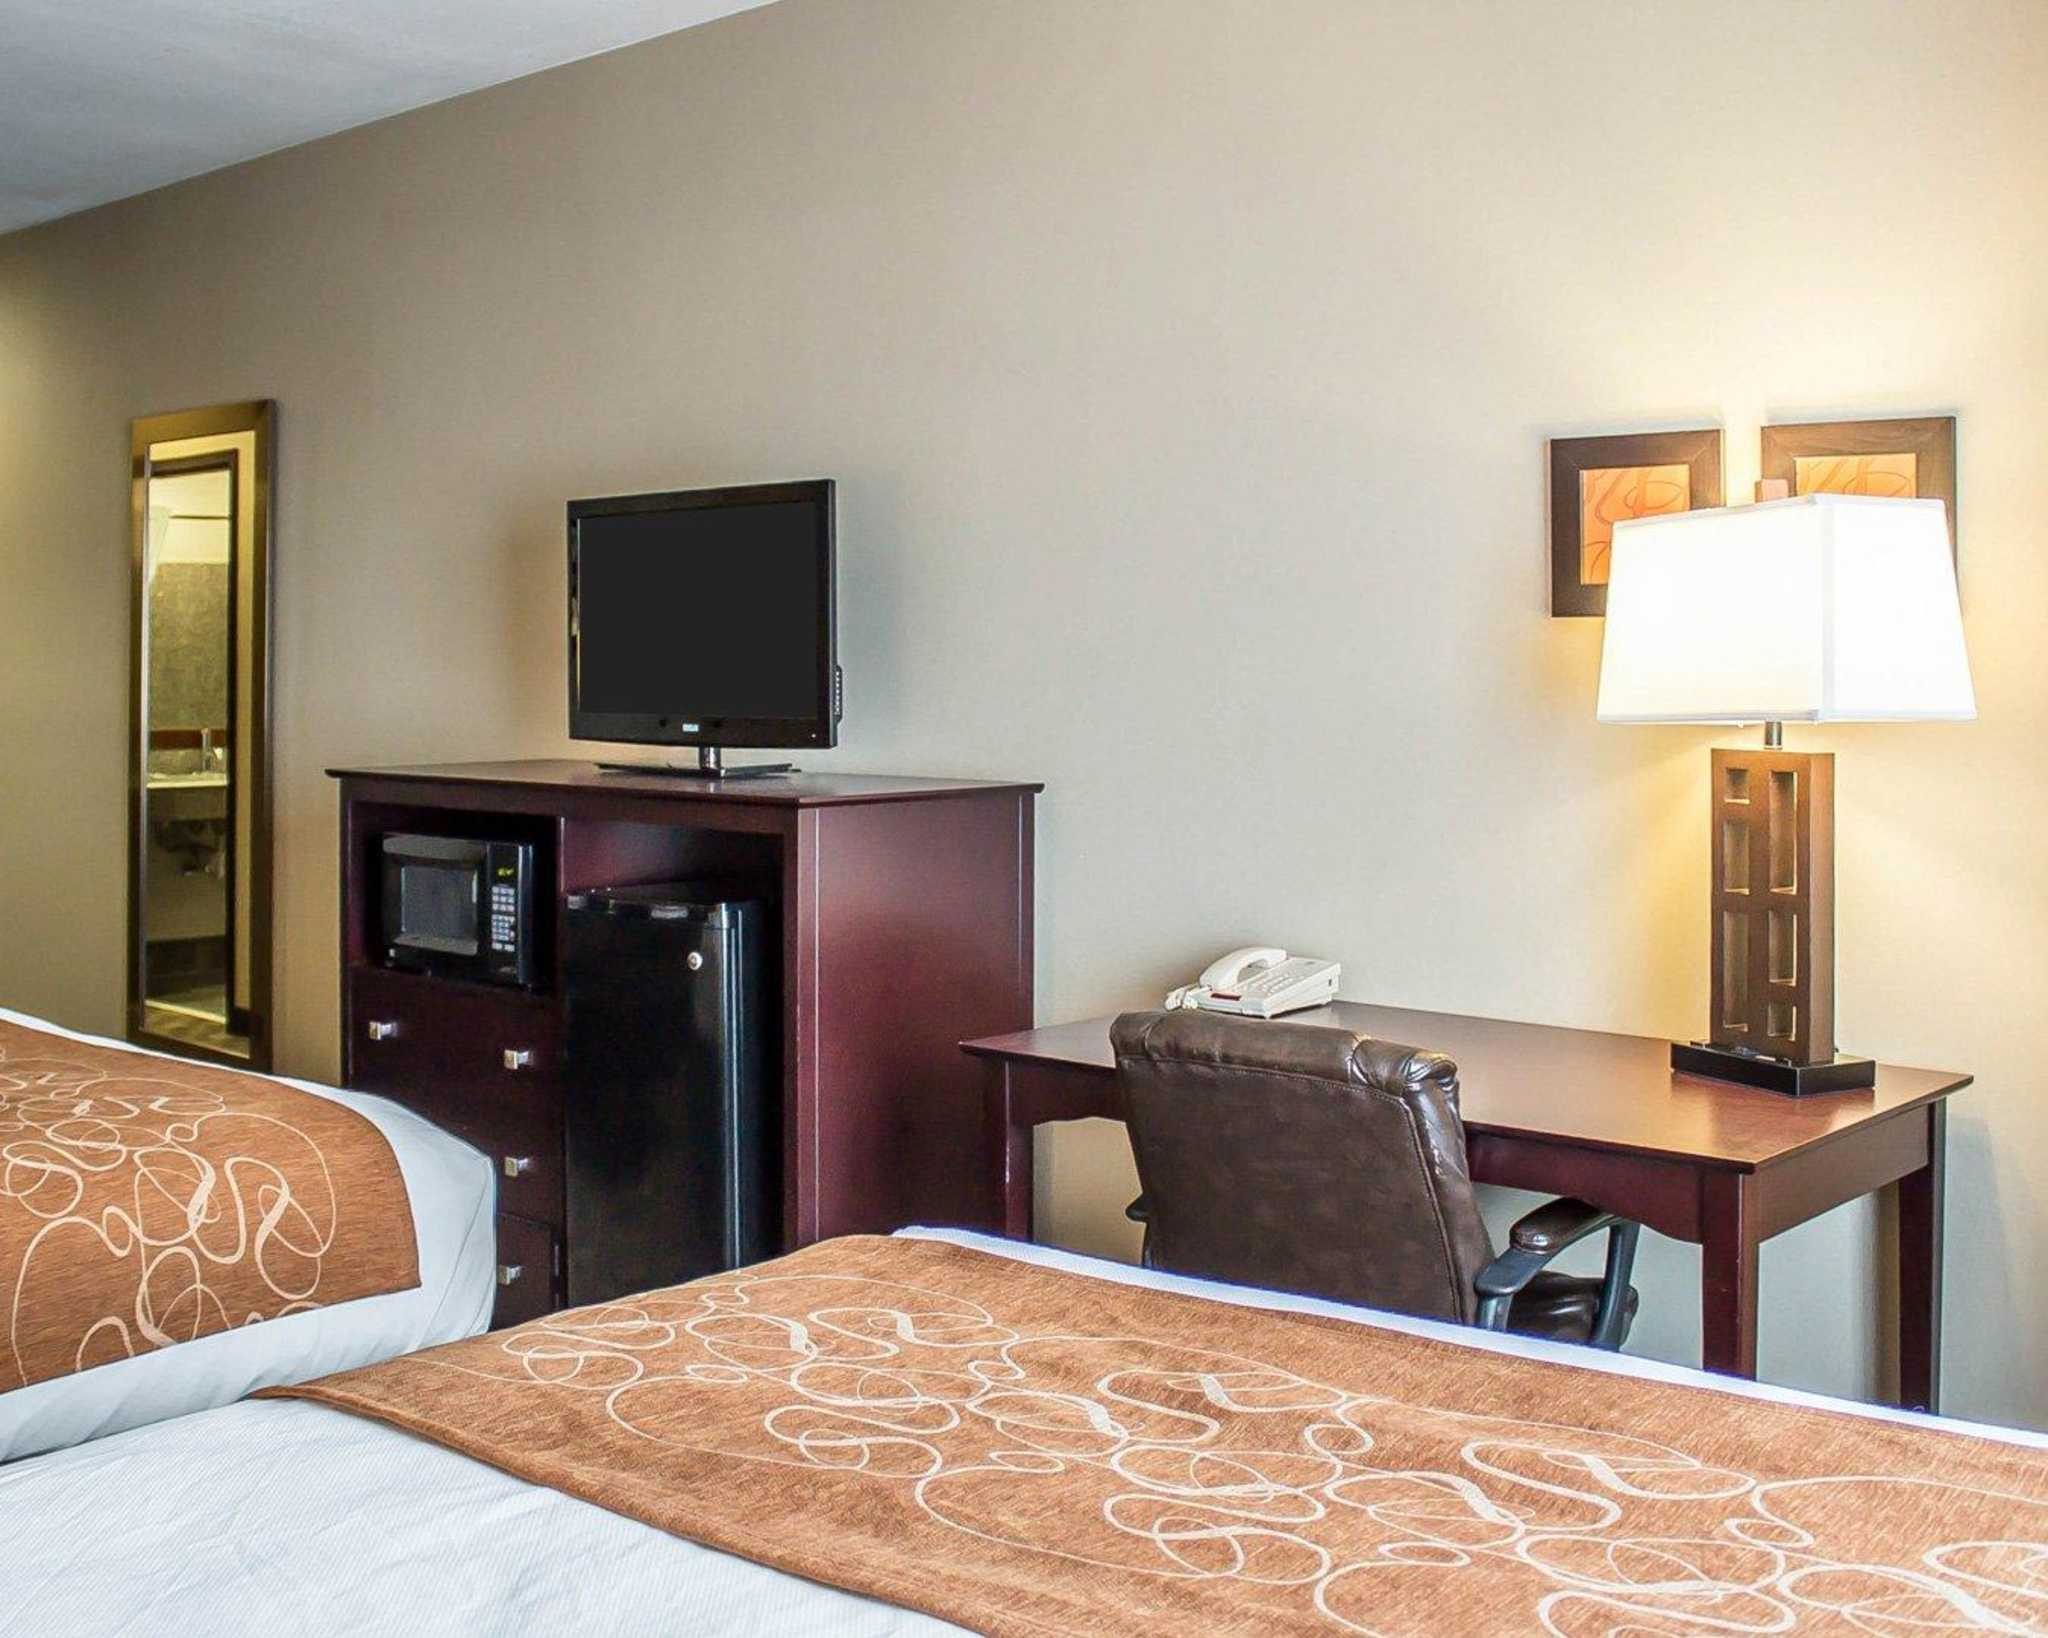 Comfort Suites Perrysburg - Toledo South image 17